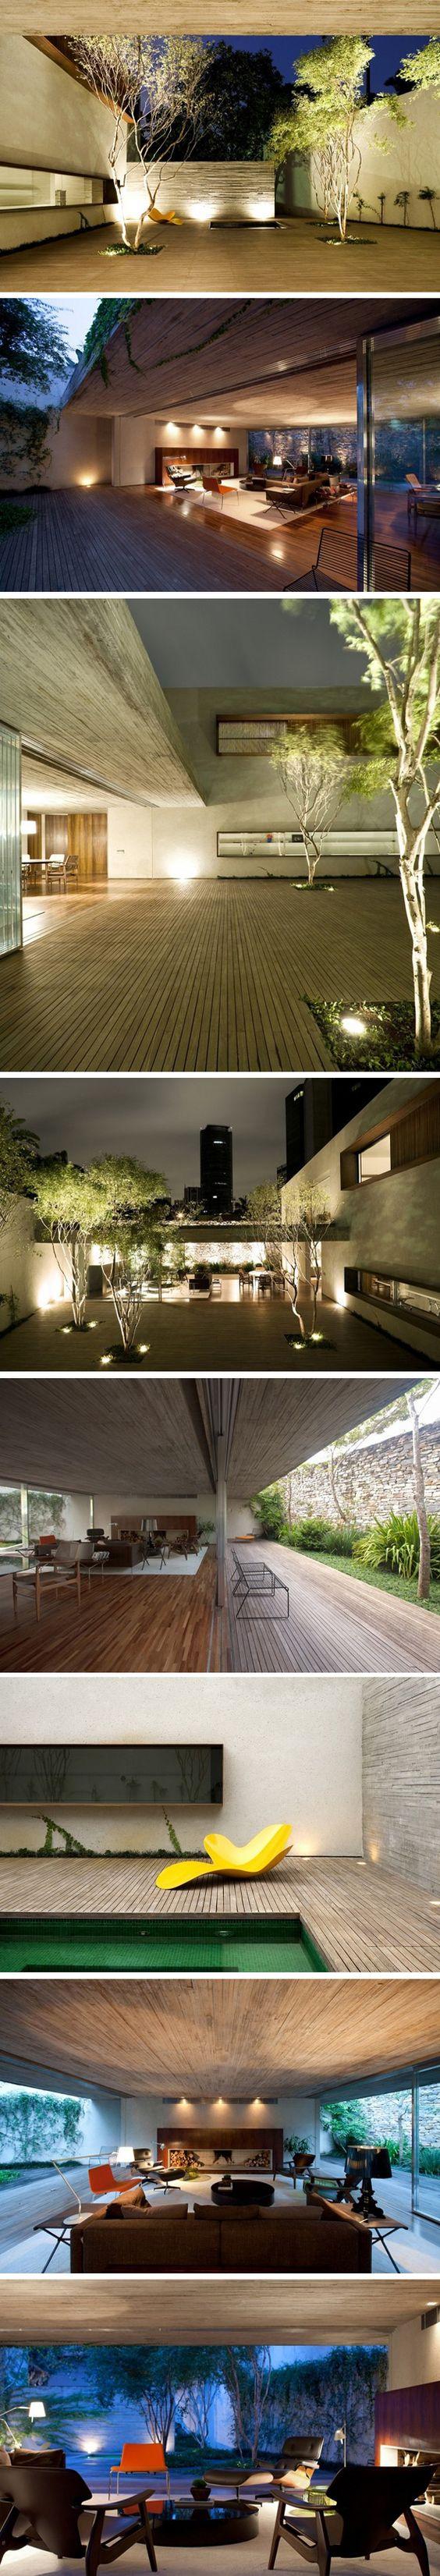 Chimney House by Marcio Kogan – Studio MK27. Sao Paulo. Love elongated one level homes with adjoinable spaces